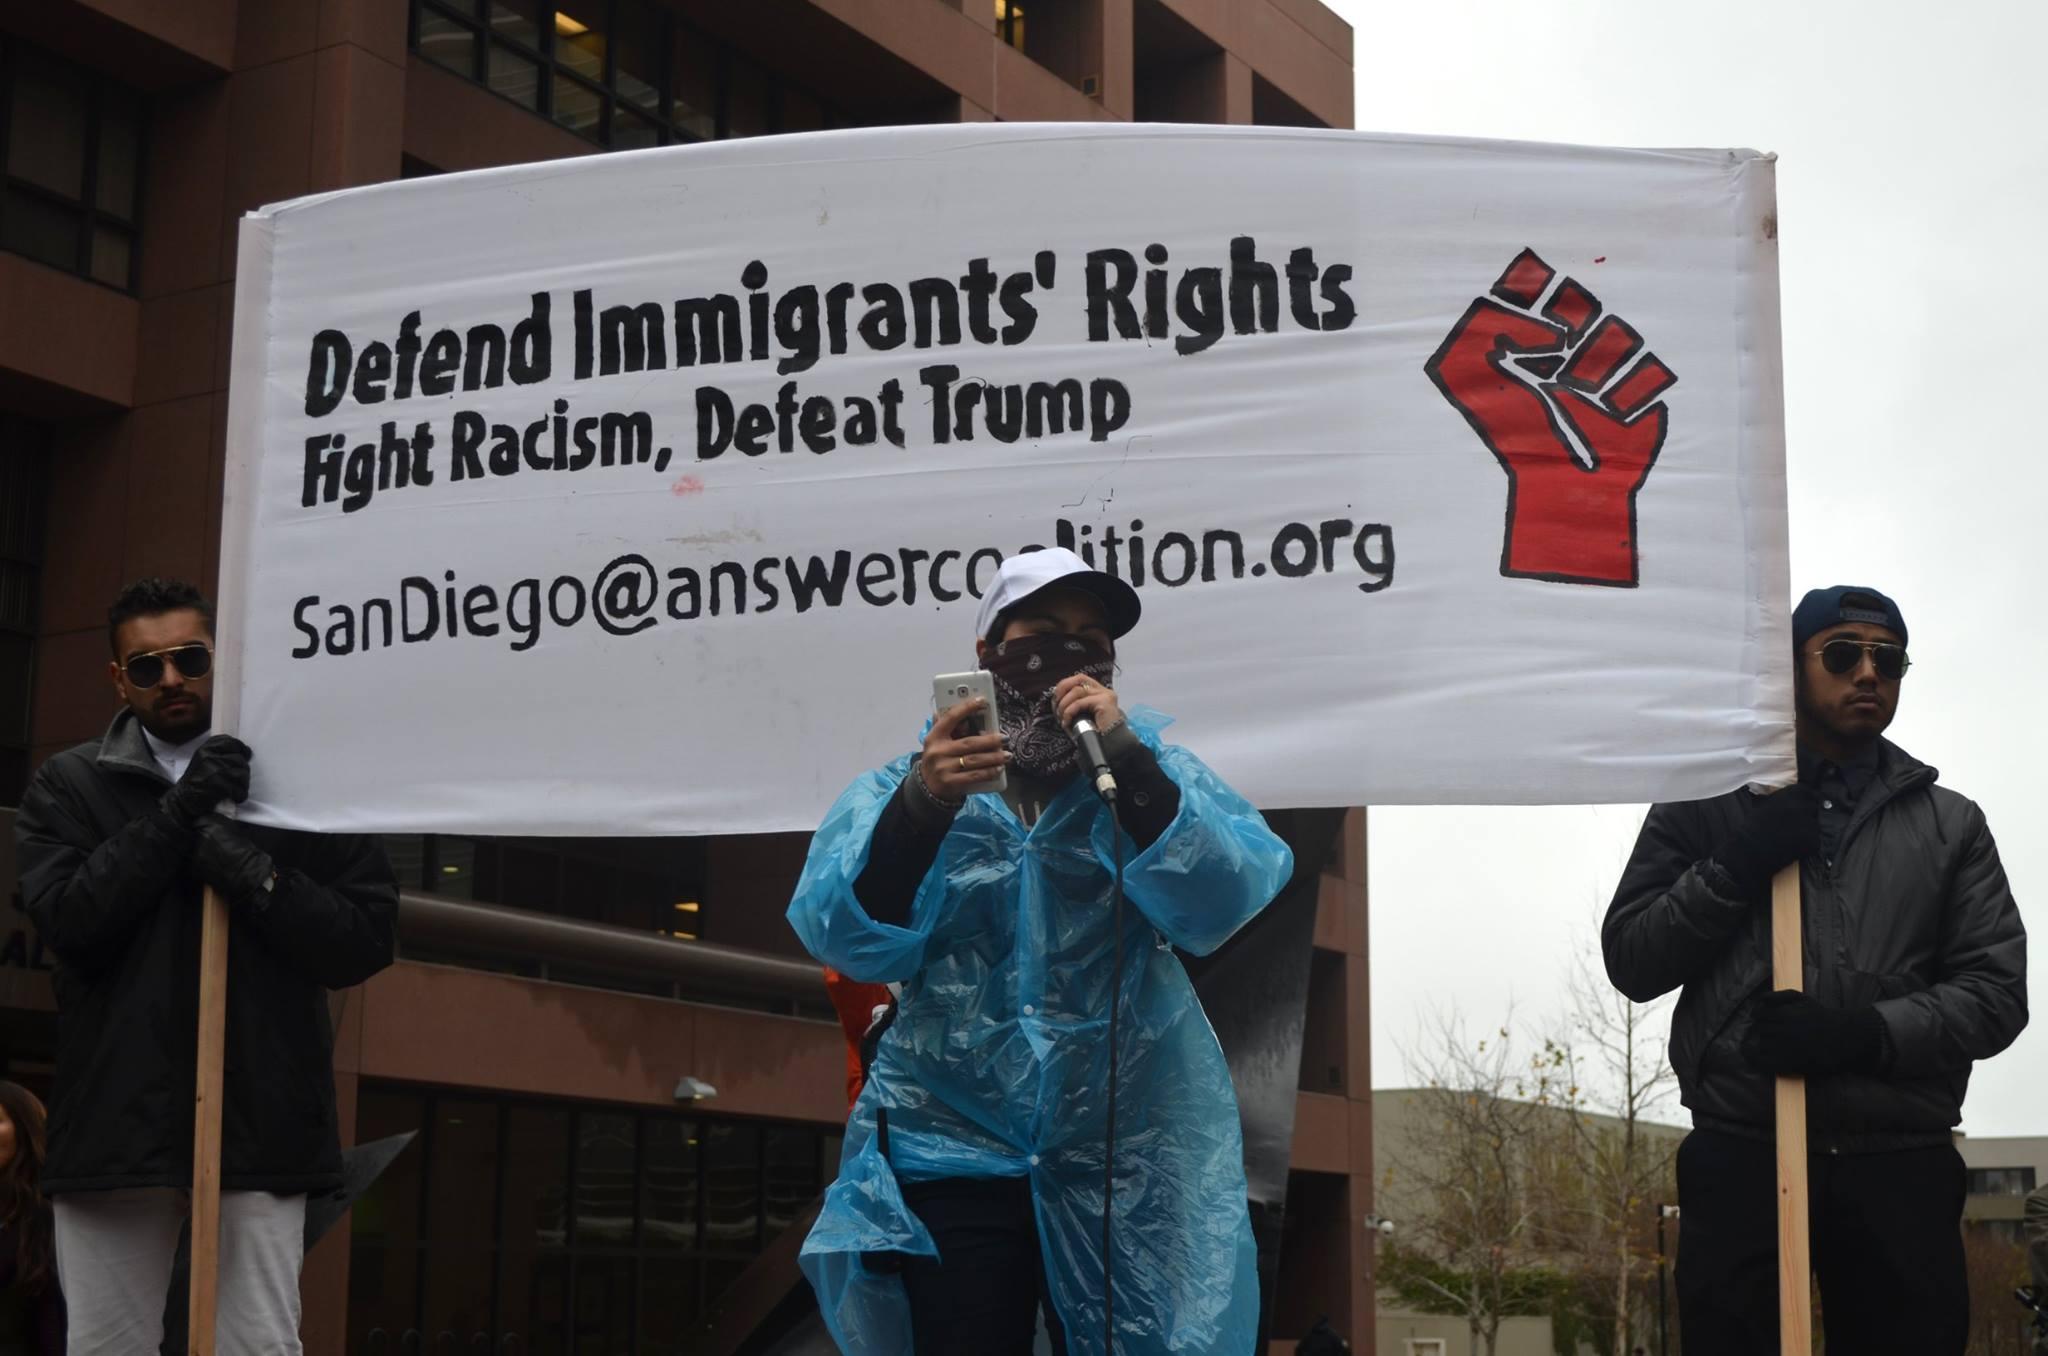 San Diego anti-Trump demonstration, Jan. 20